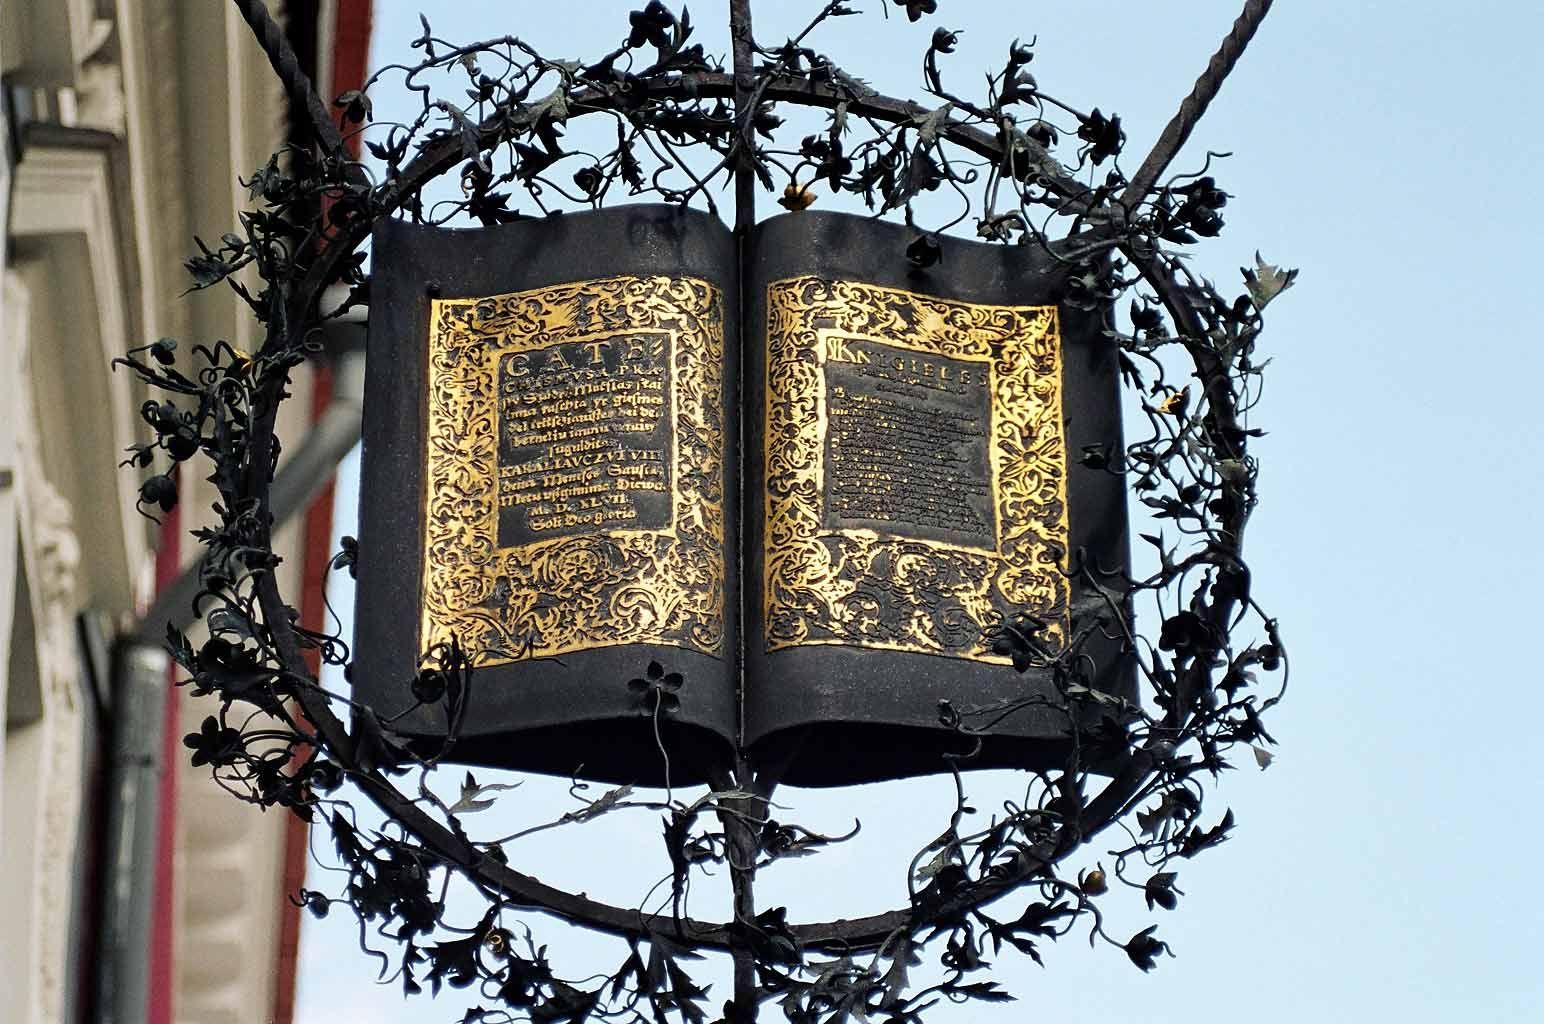 Storybook gate sign*